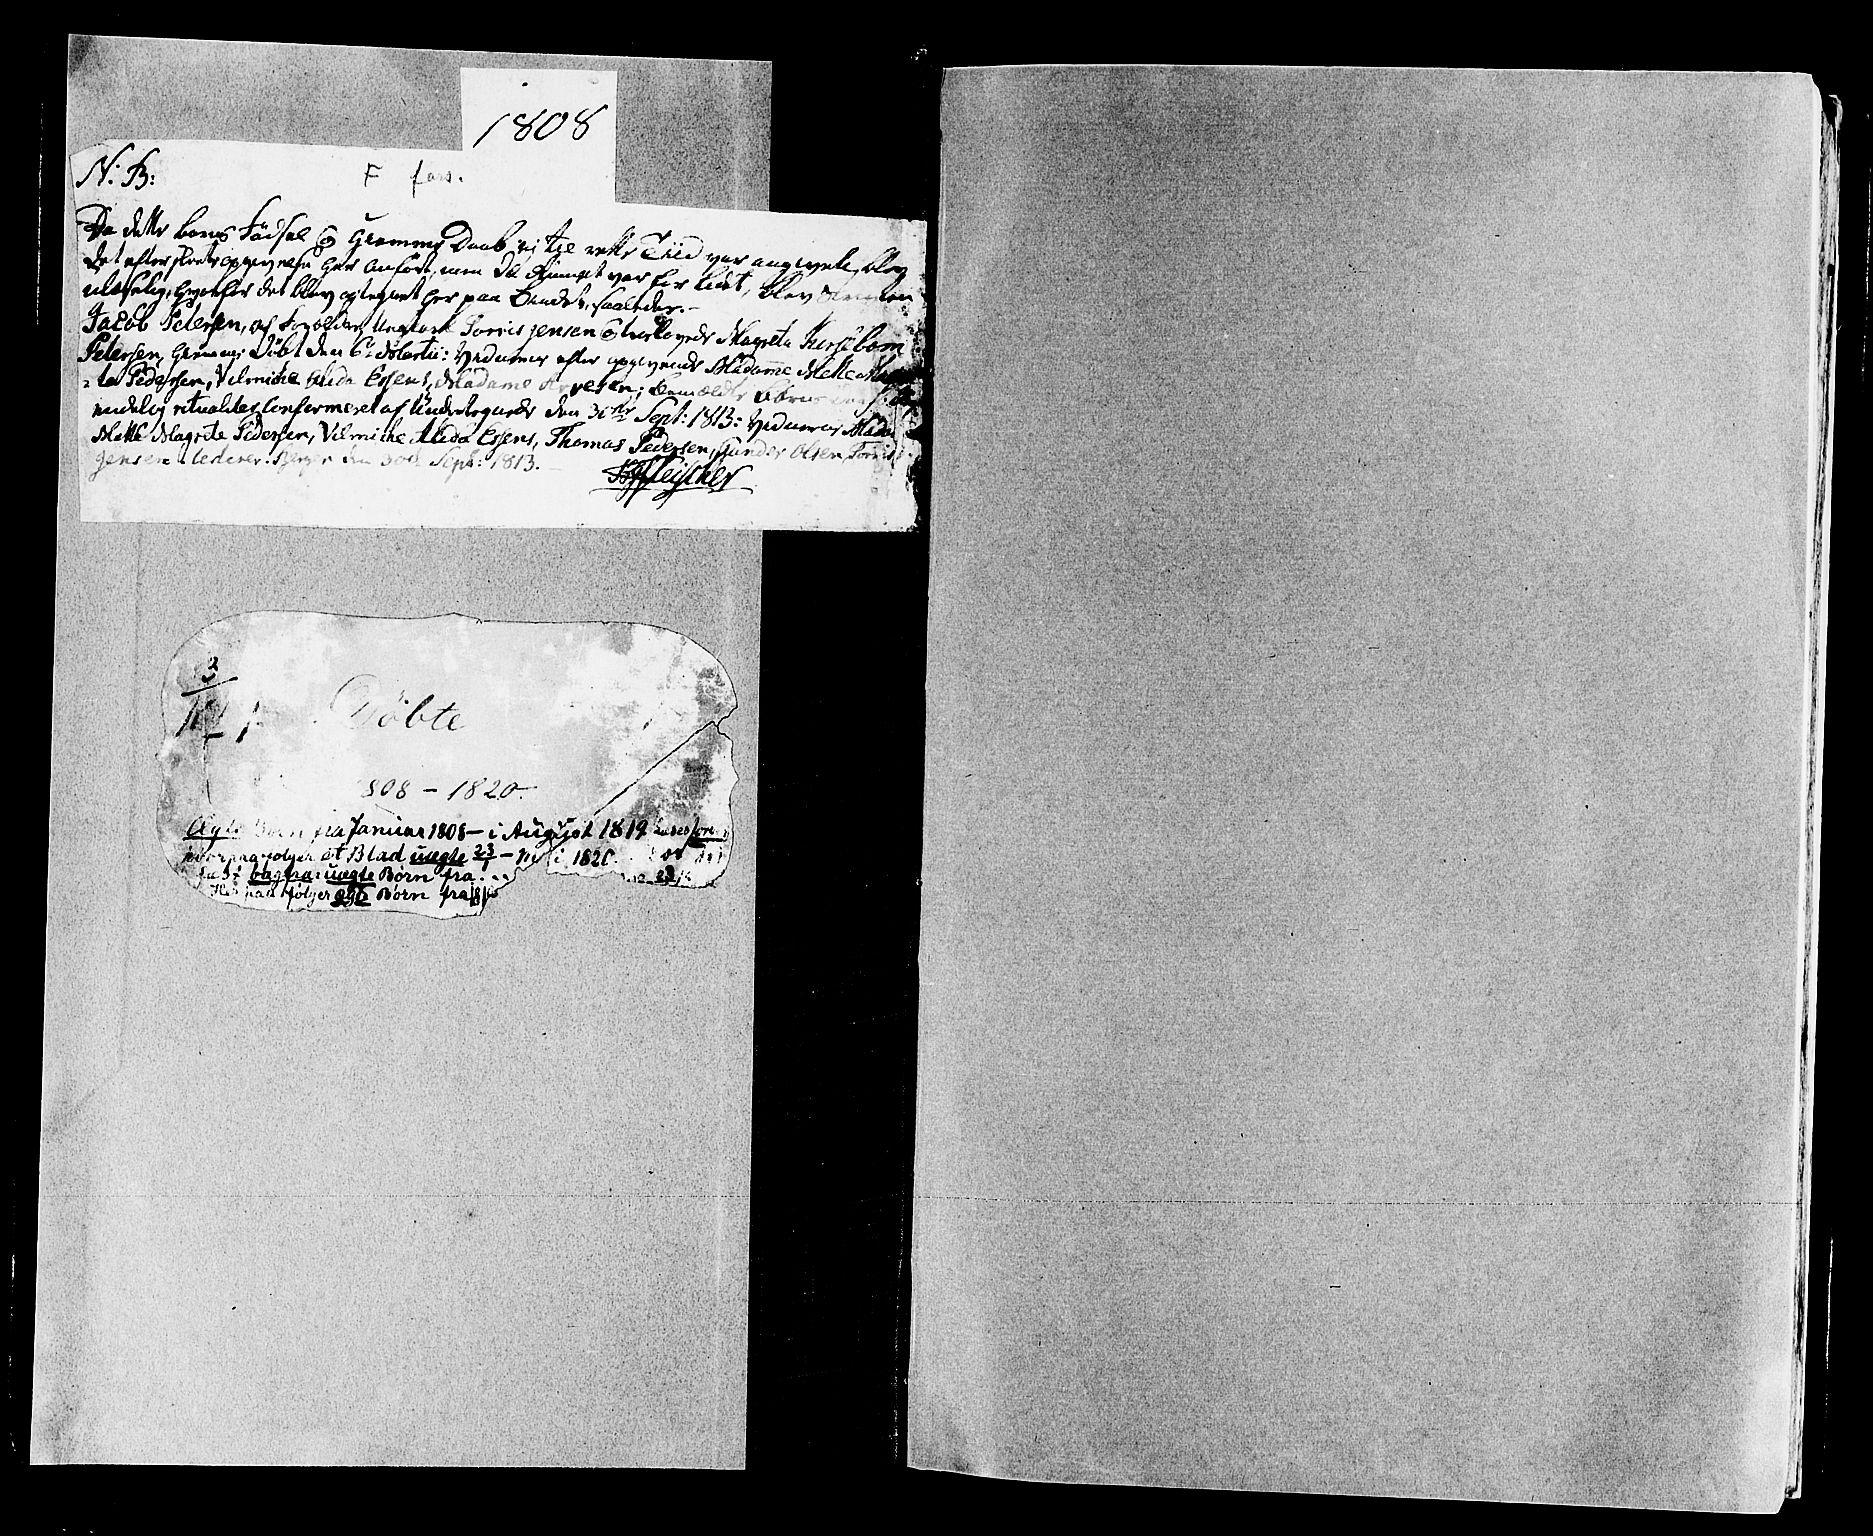 SAB, Domkirken Sokneprestembete, H/Haa/L0005: Ministerialbok nr. A 5, 1808-1820